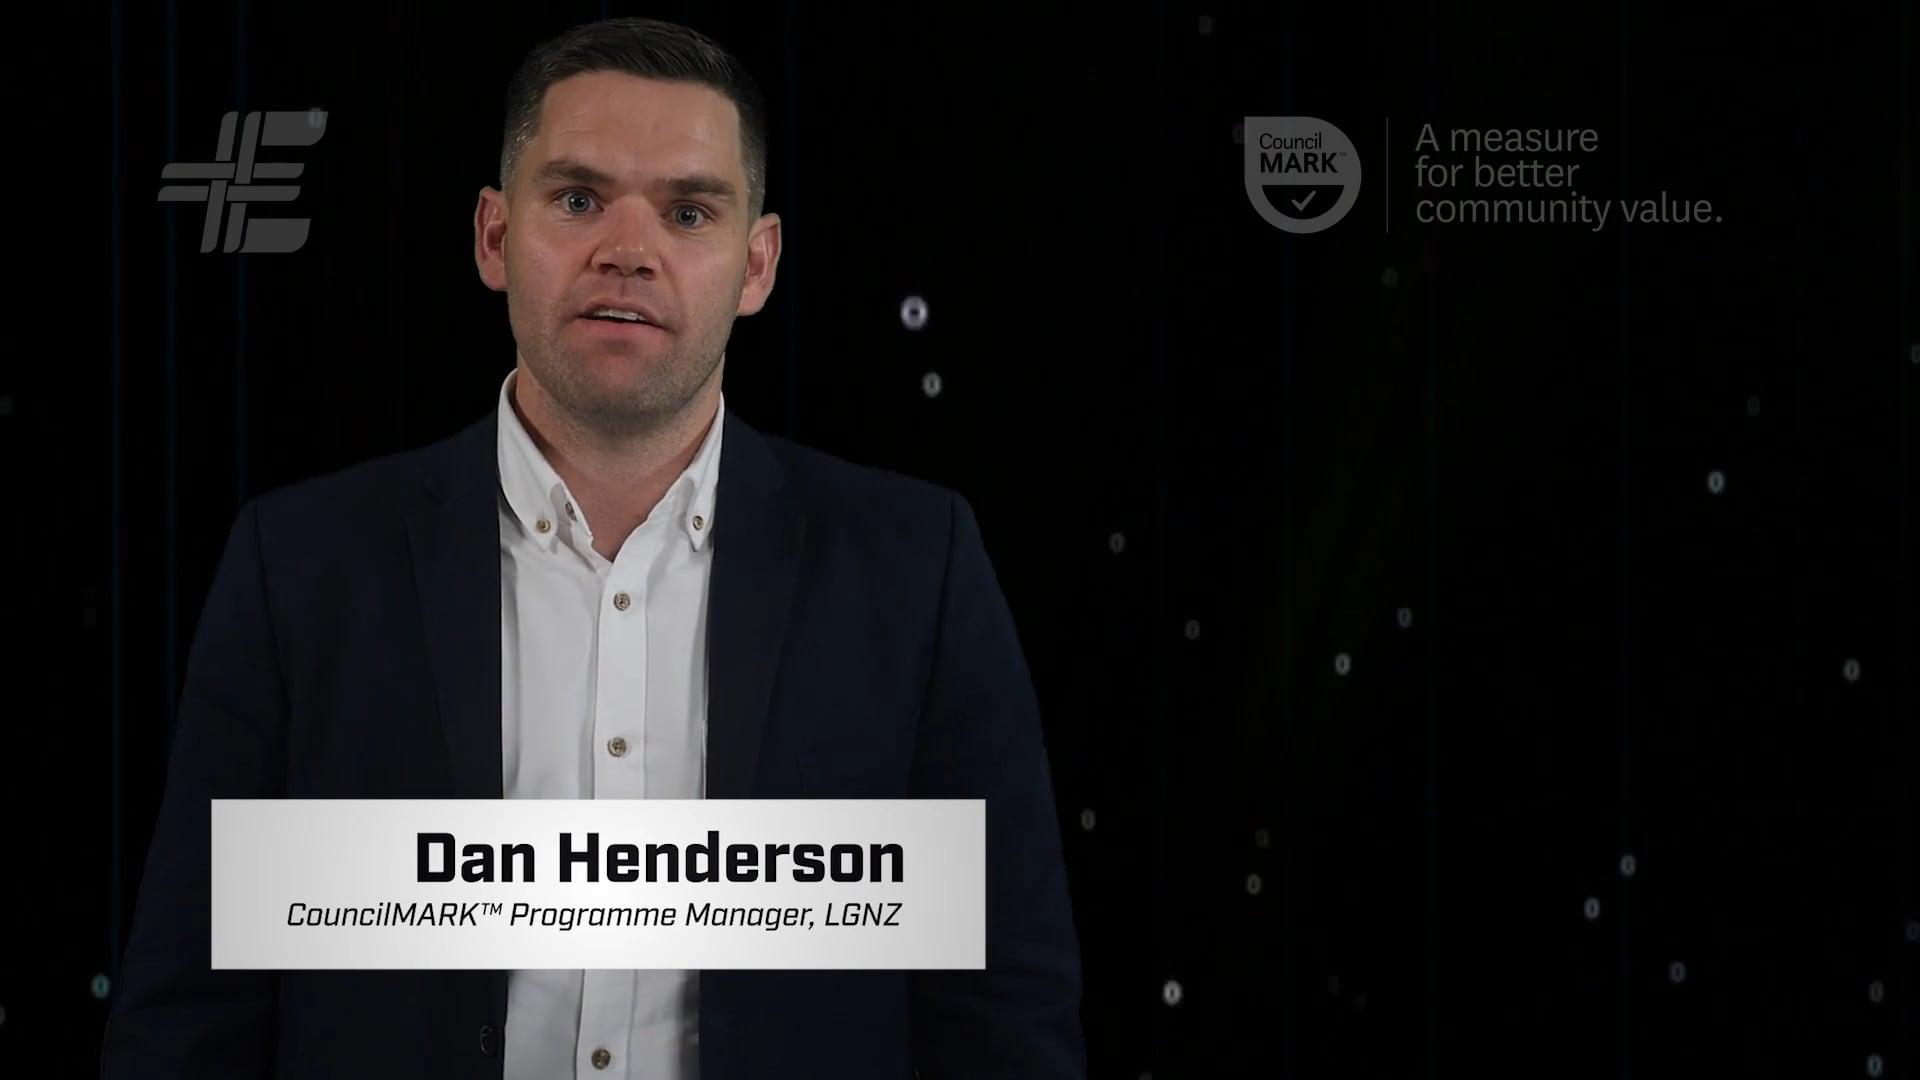 Dan Henderson, CouncilMARK™ Programme Manager, LGNZ